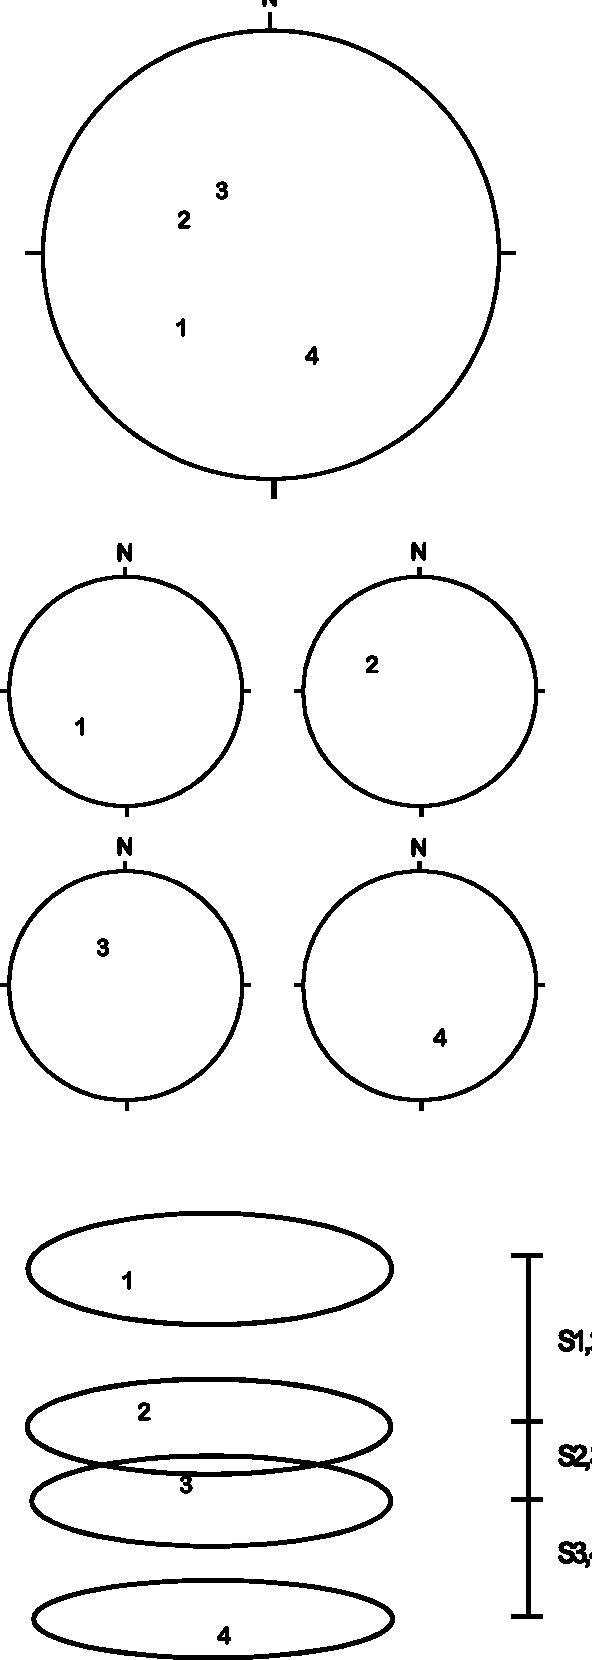 PDF] Multivariate Clustering Analysis of the ECRB Cross Drift ...